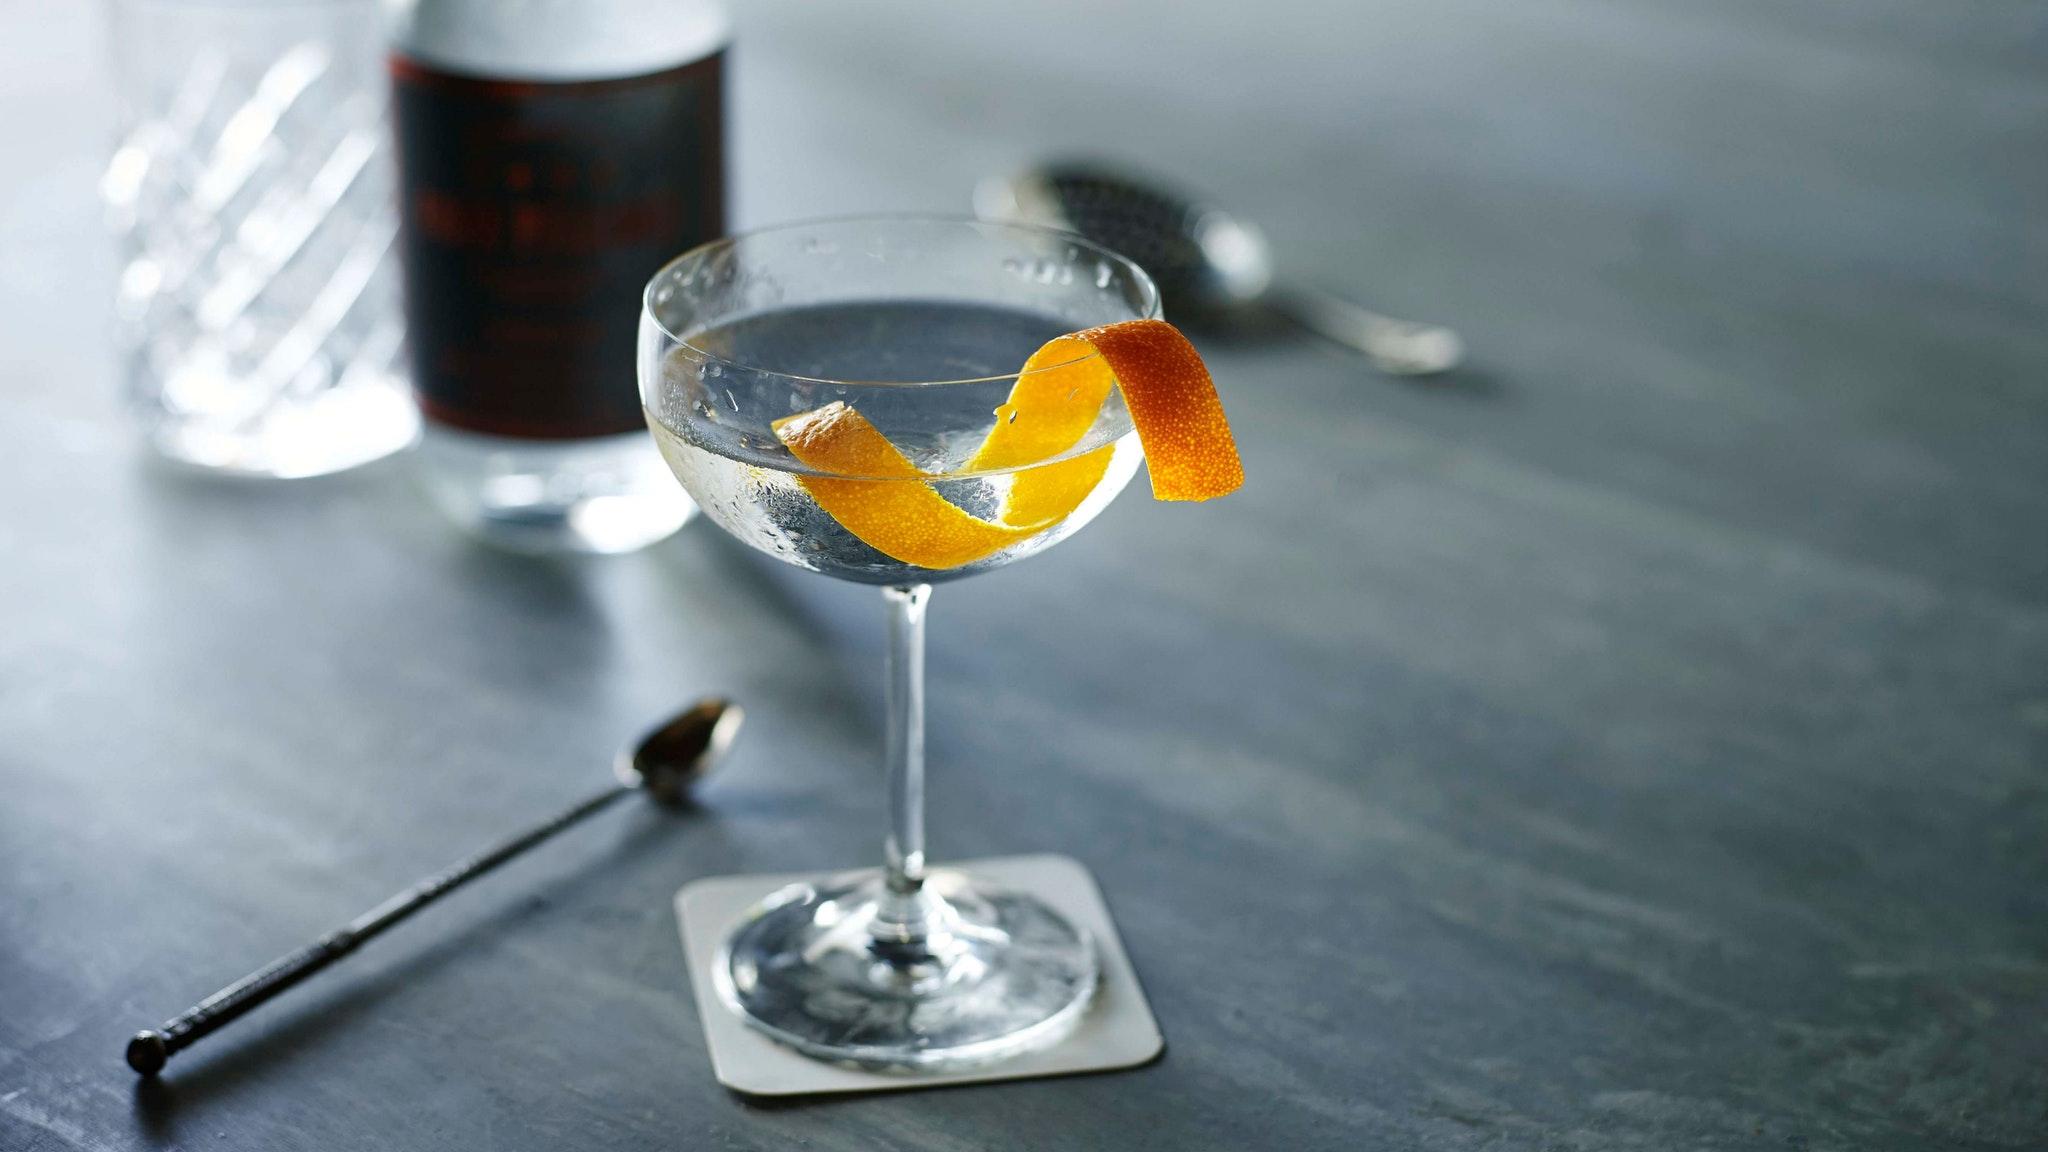 Martini - Four Pillar Four Course Four Cocktails